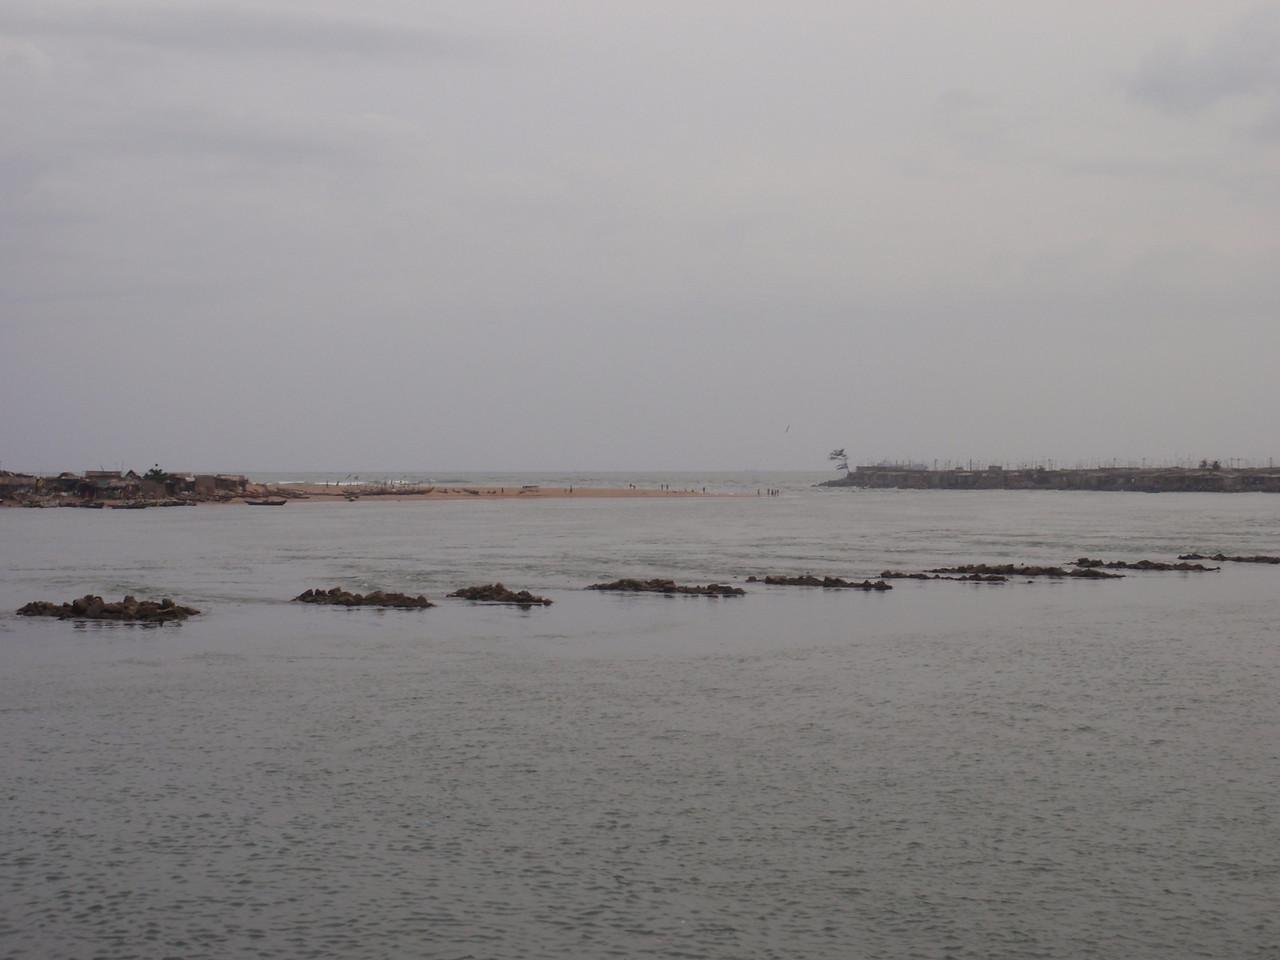 137_Cotonou  The Cotonou Lagoon Meets the Gulf of Guinea